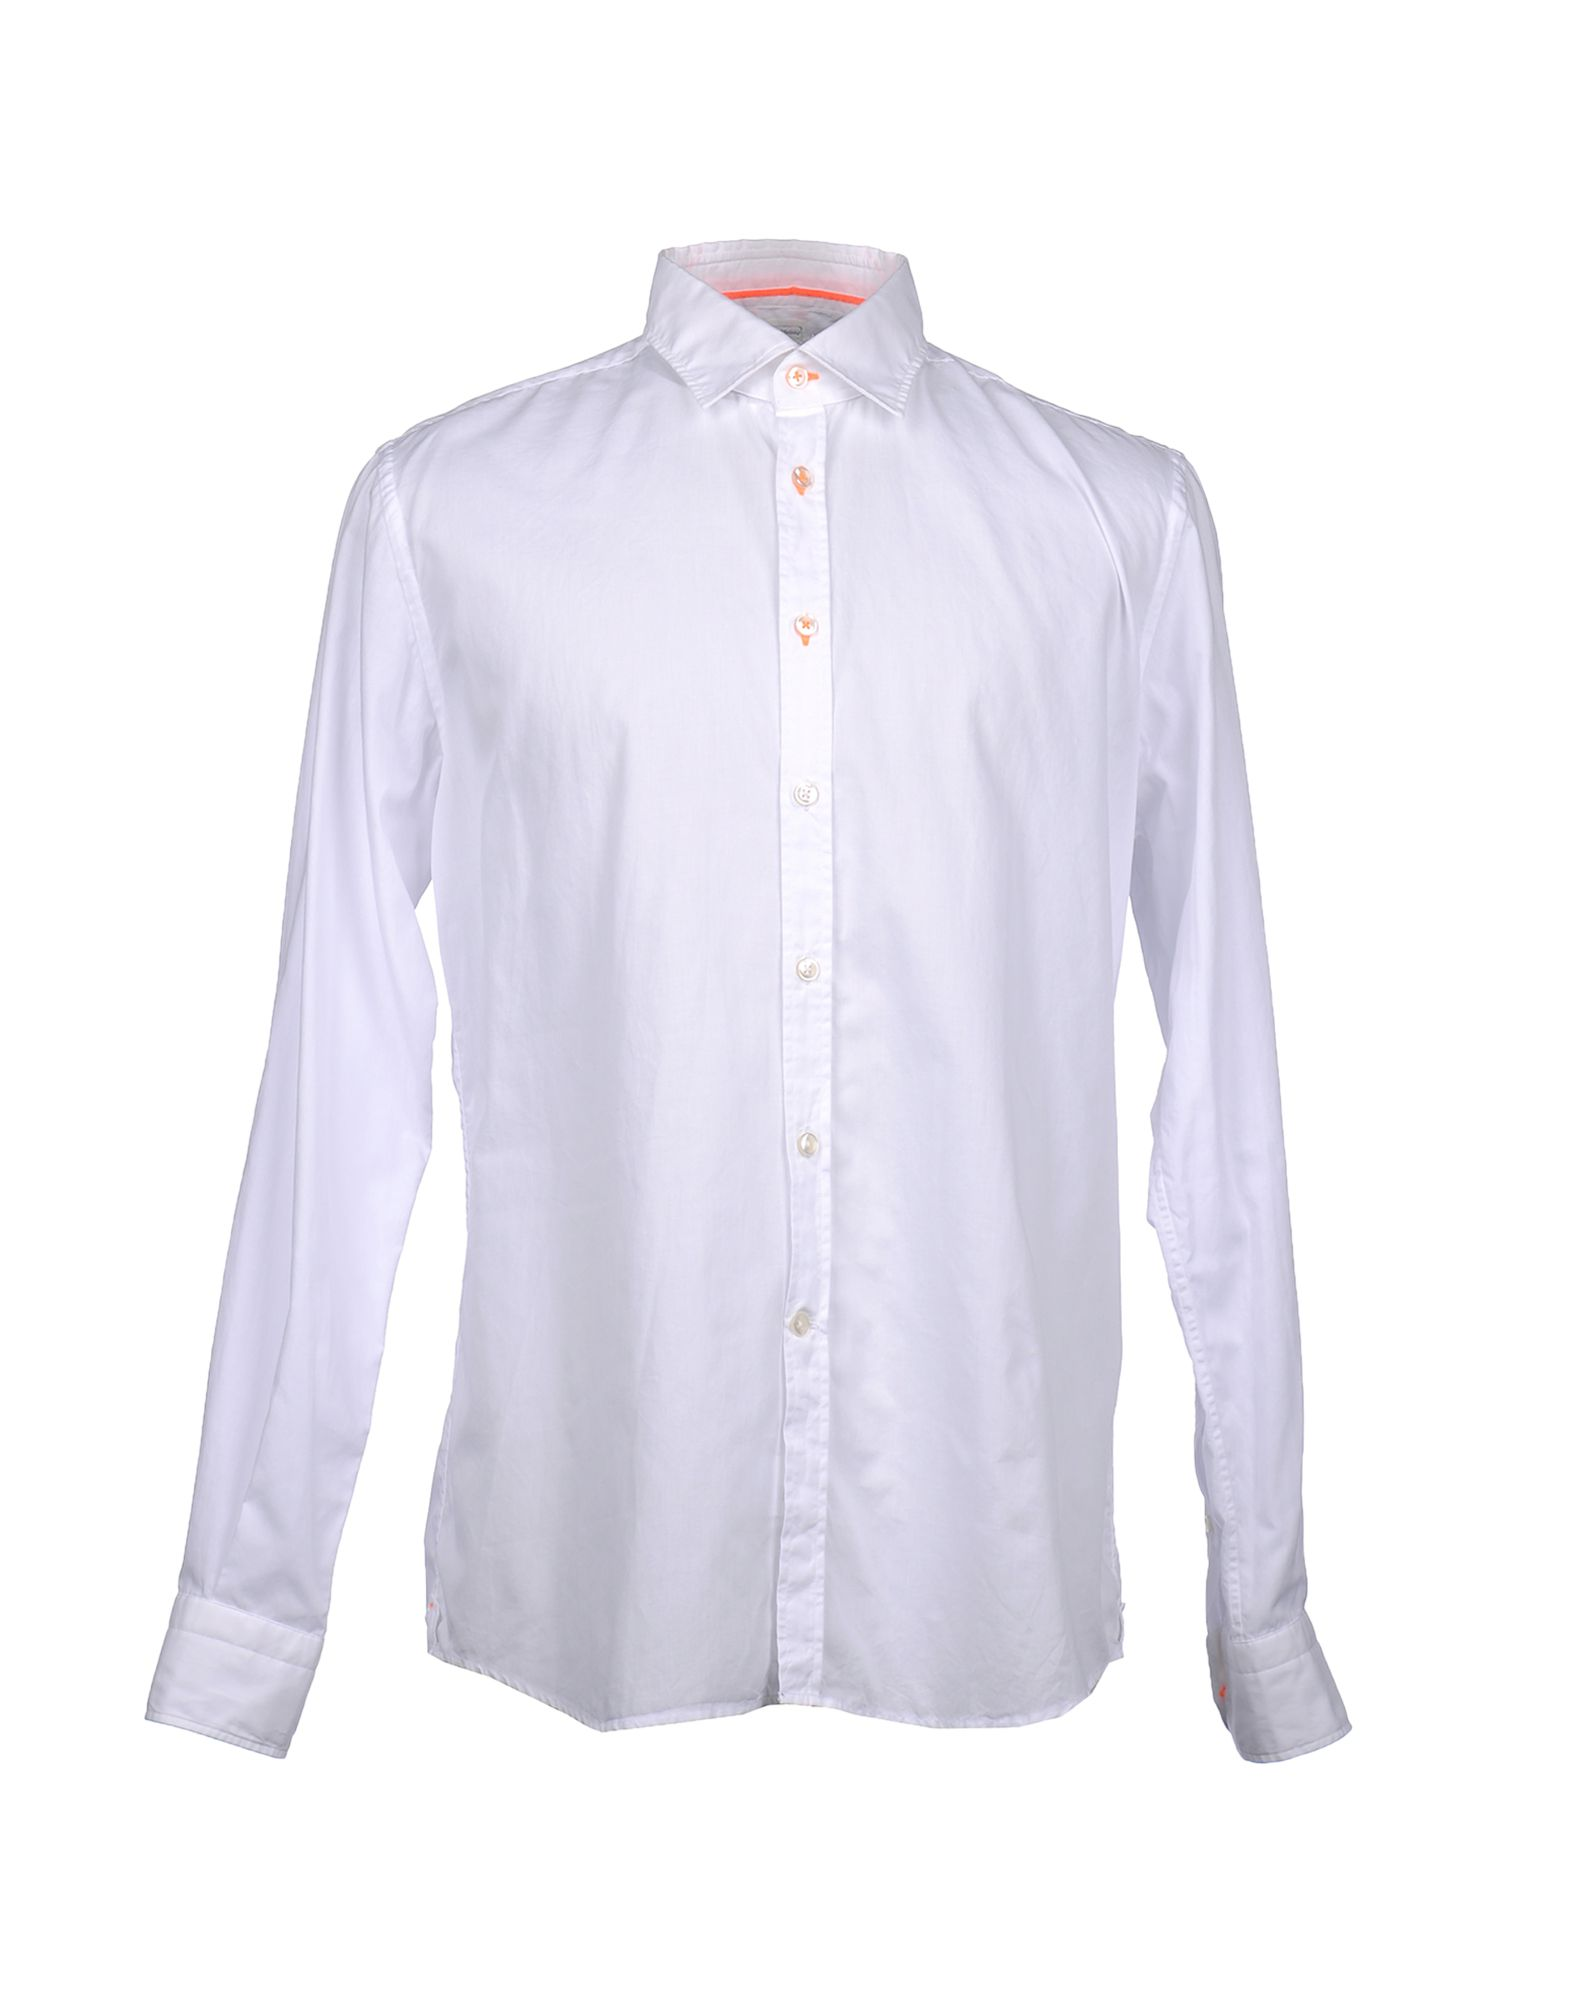 Фото - DEL SIENA Рубашка с длинными рукавами рубашка однотонная с длинными рукавами